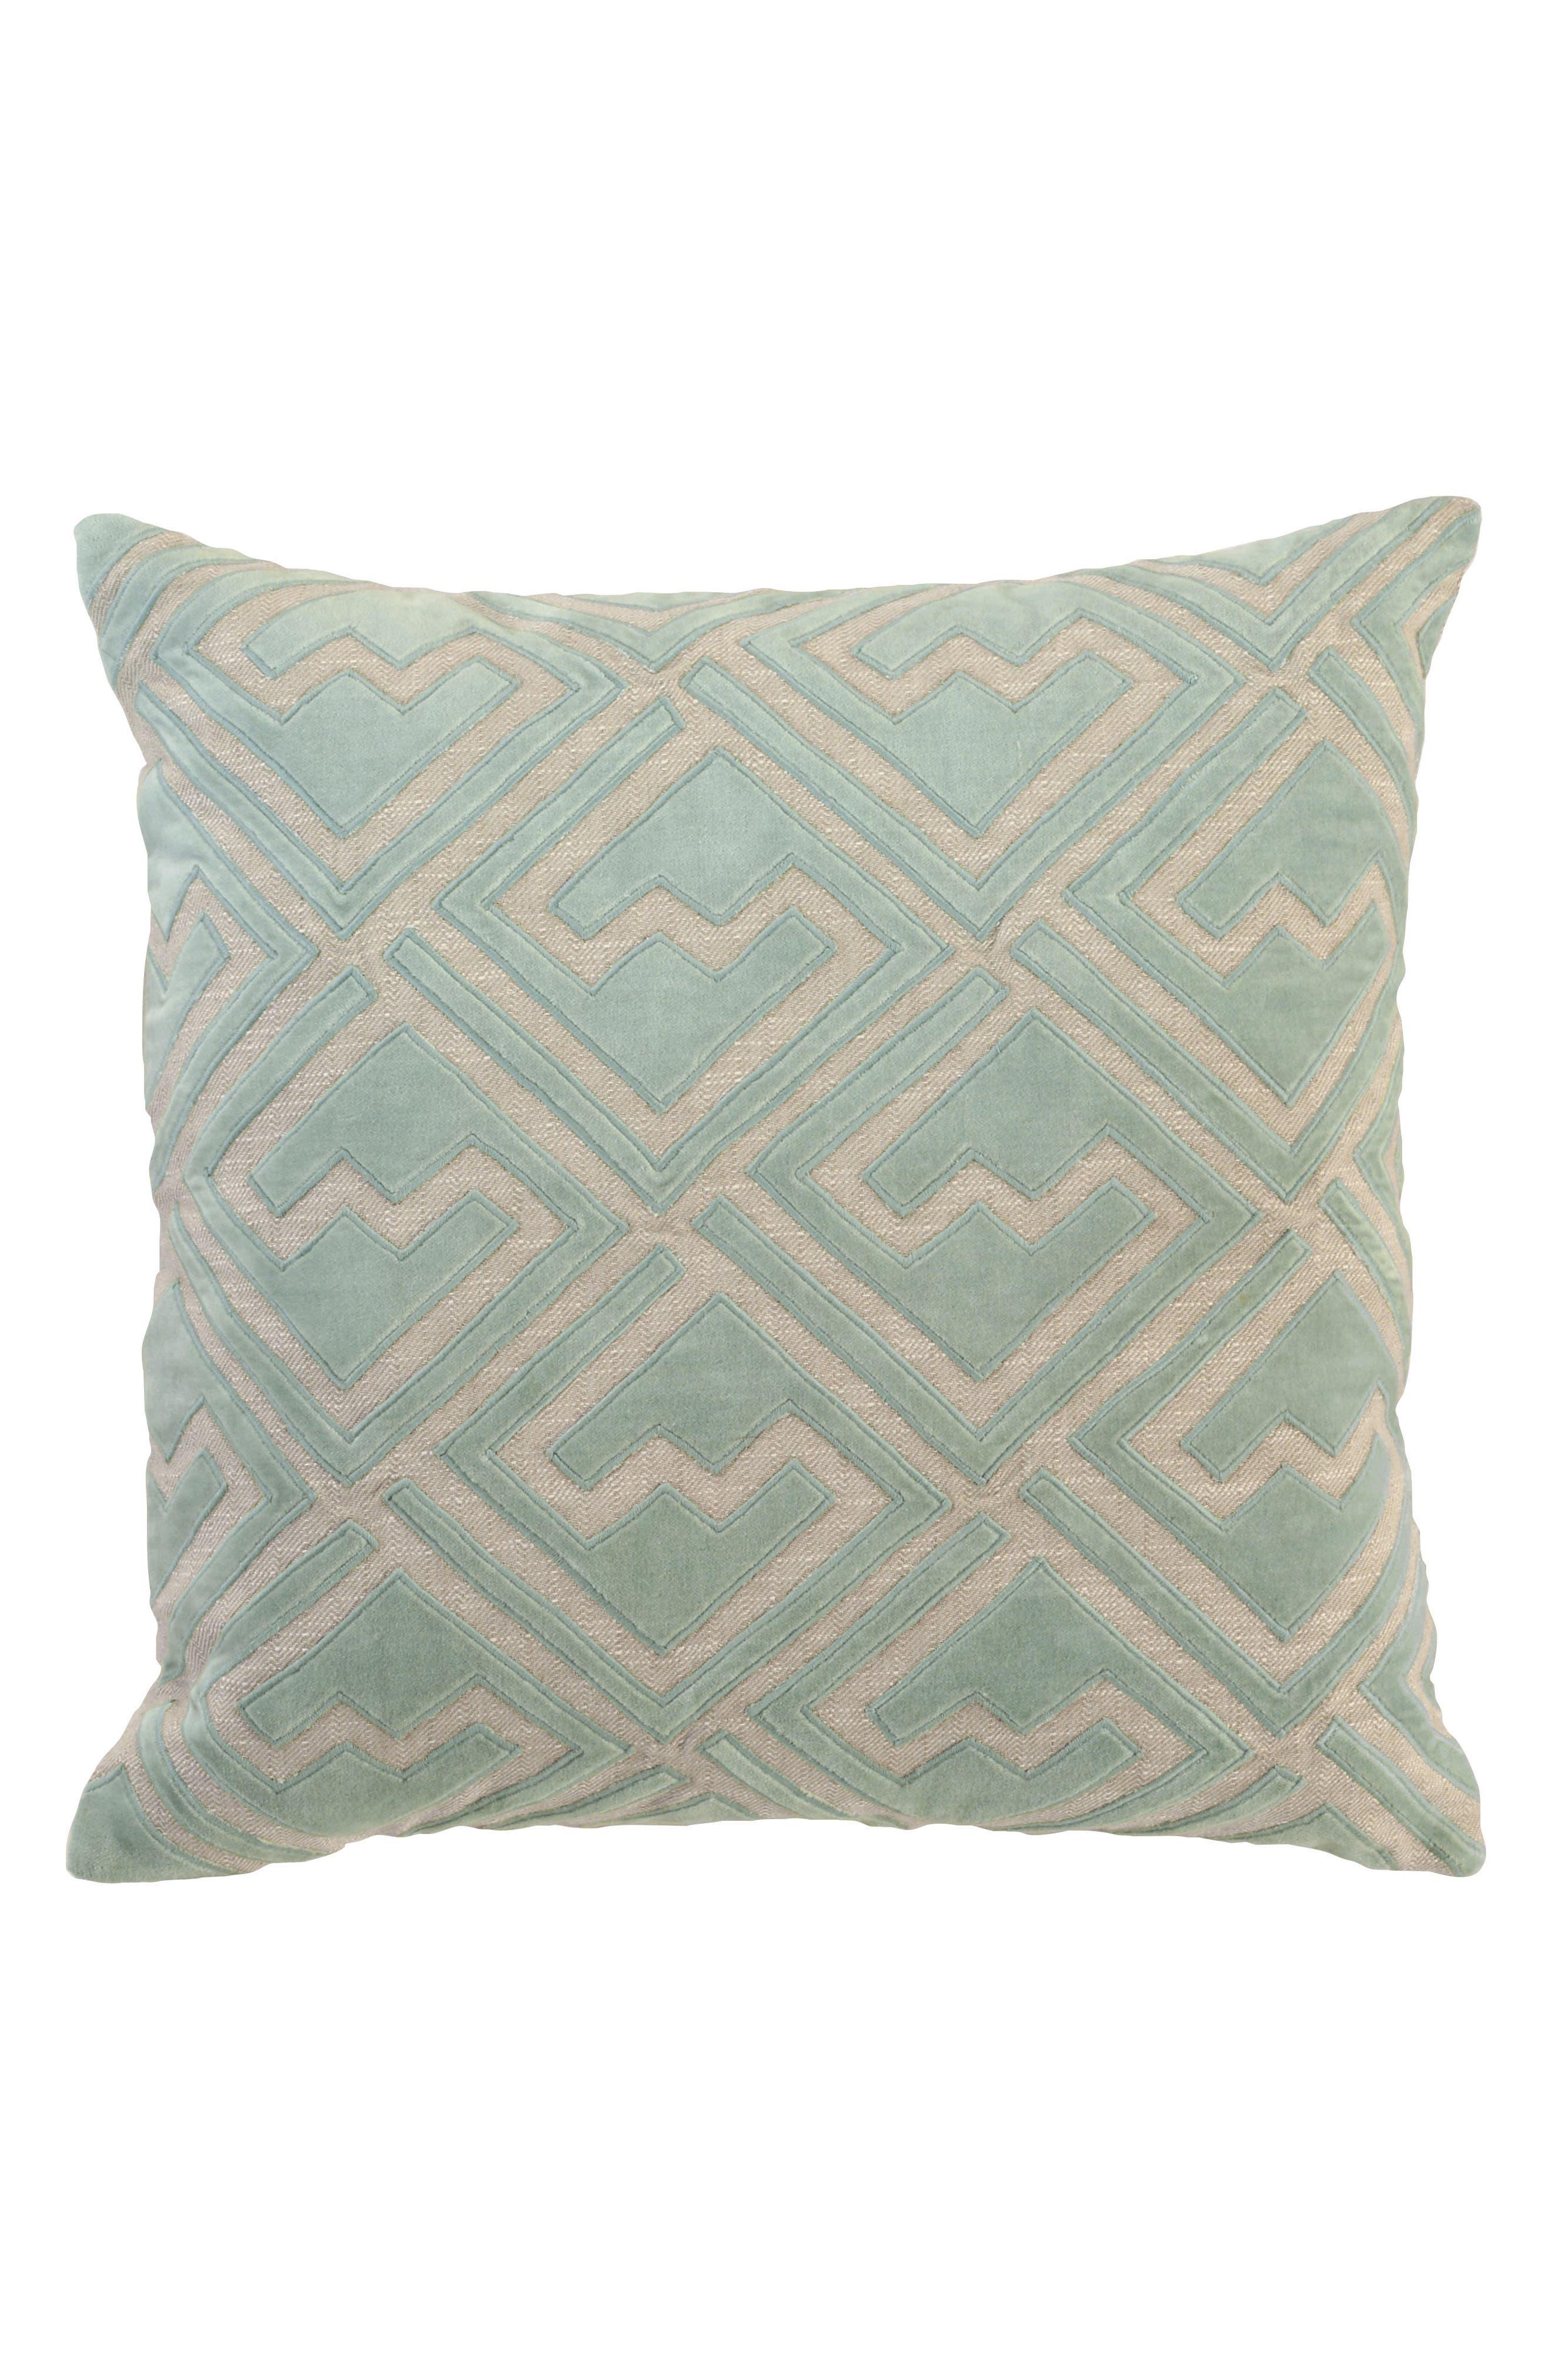 Villa Home Collection Ragno Accent Pillow